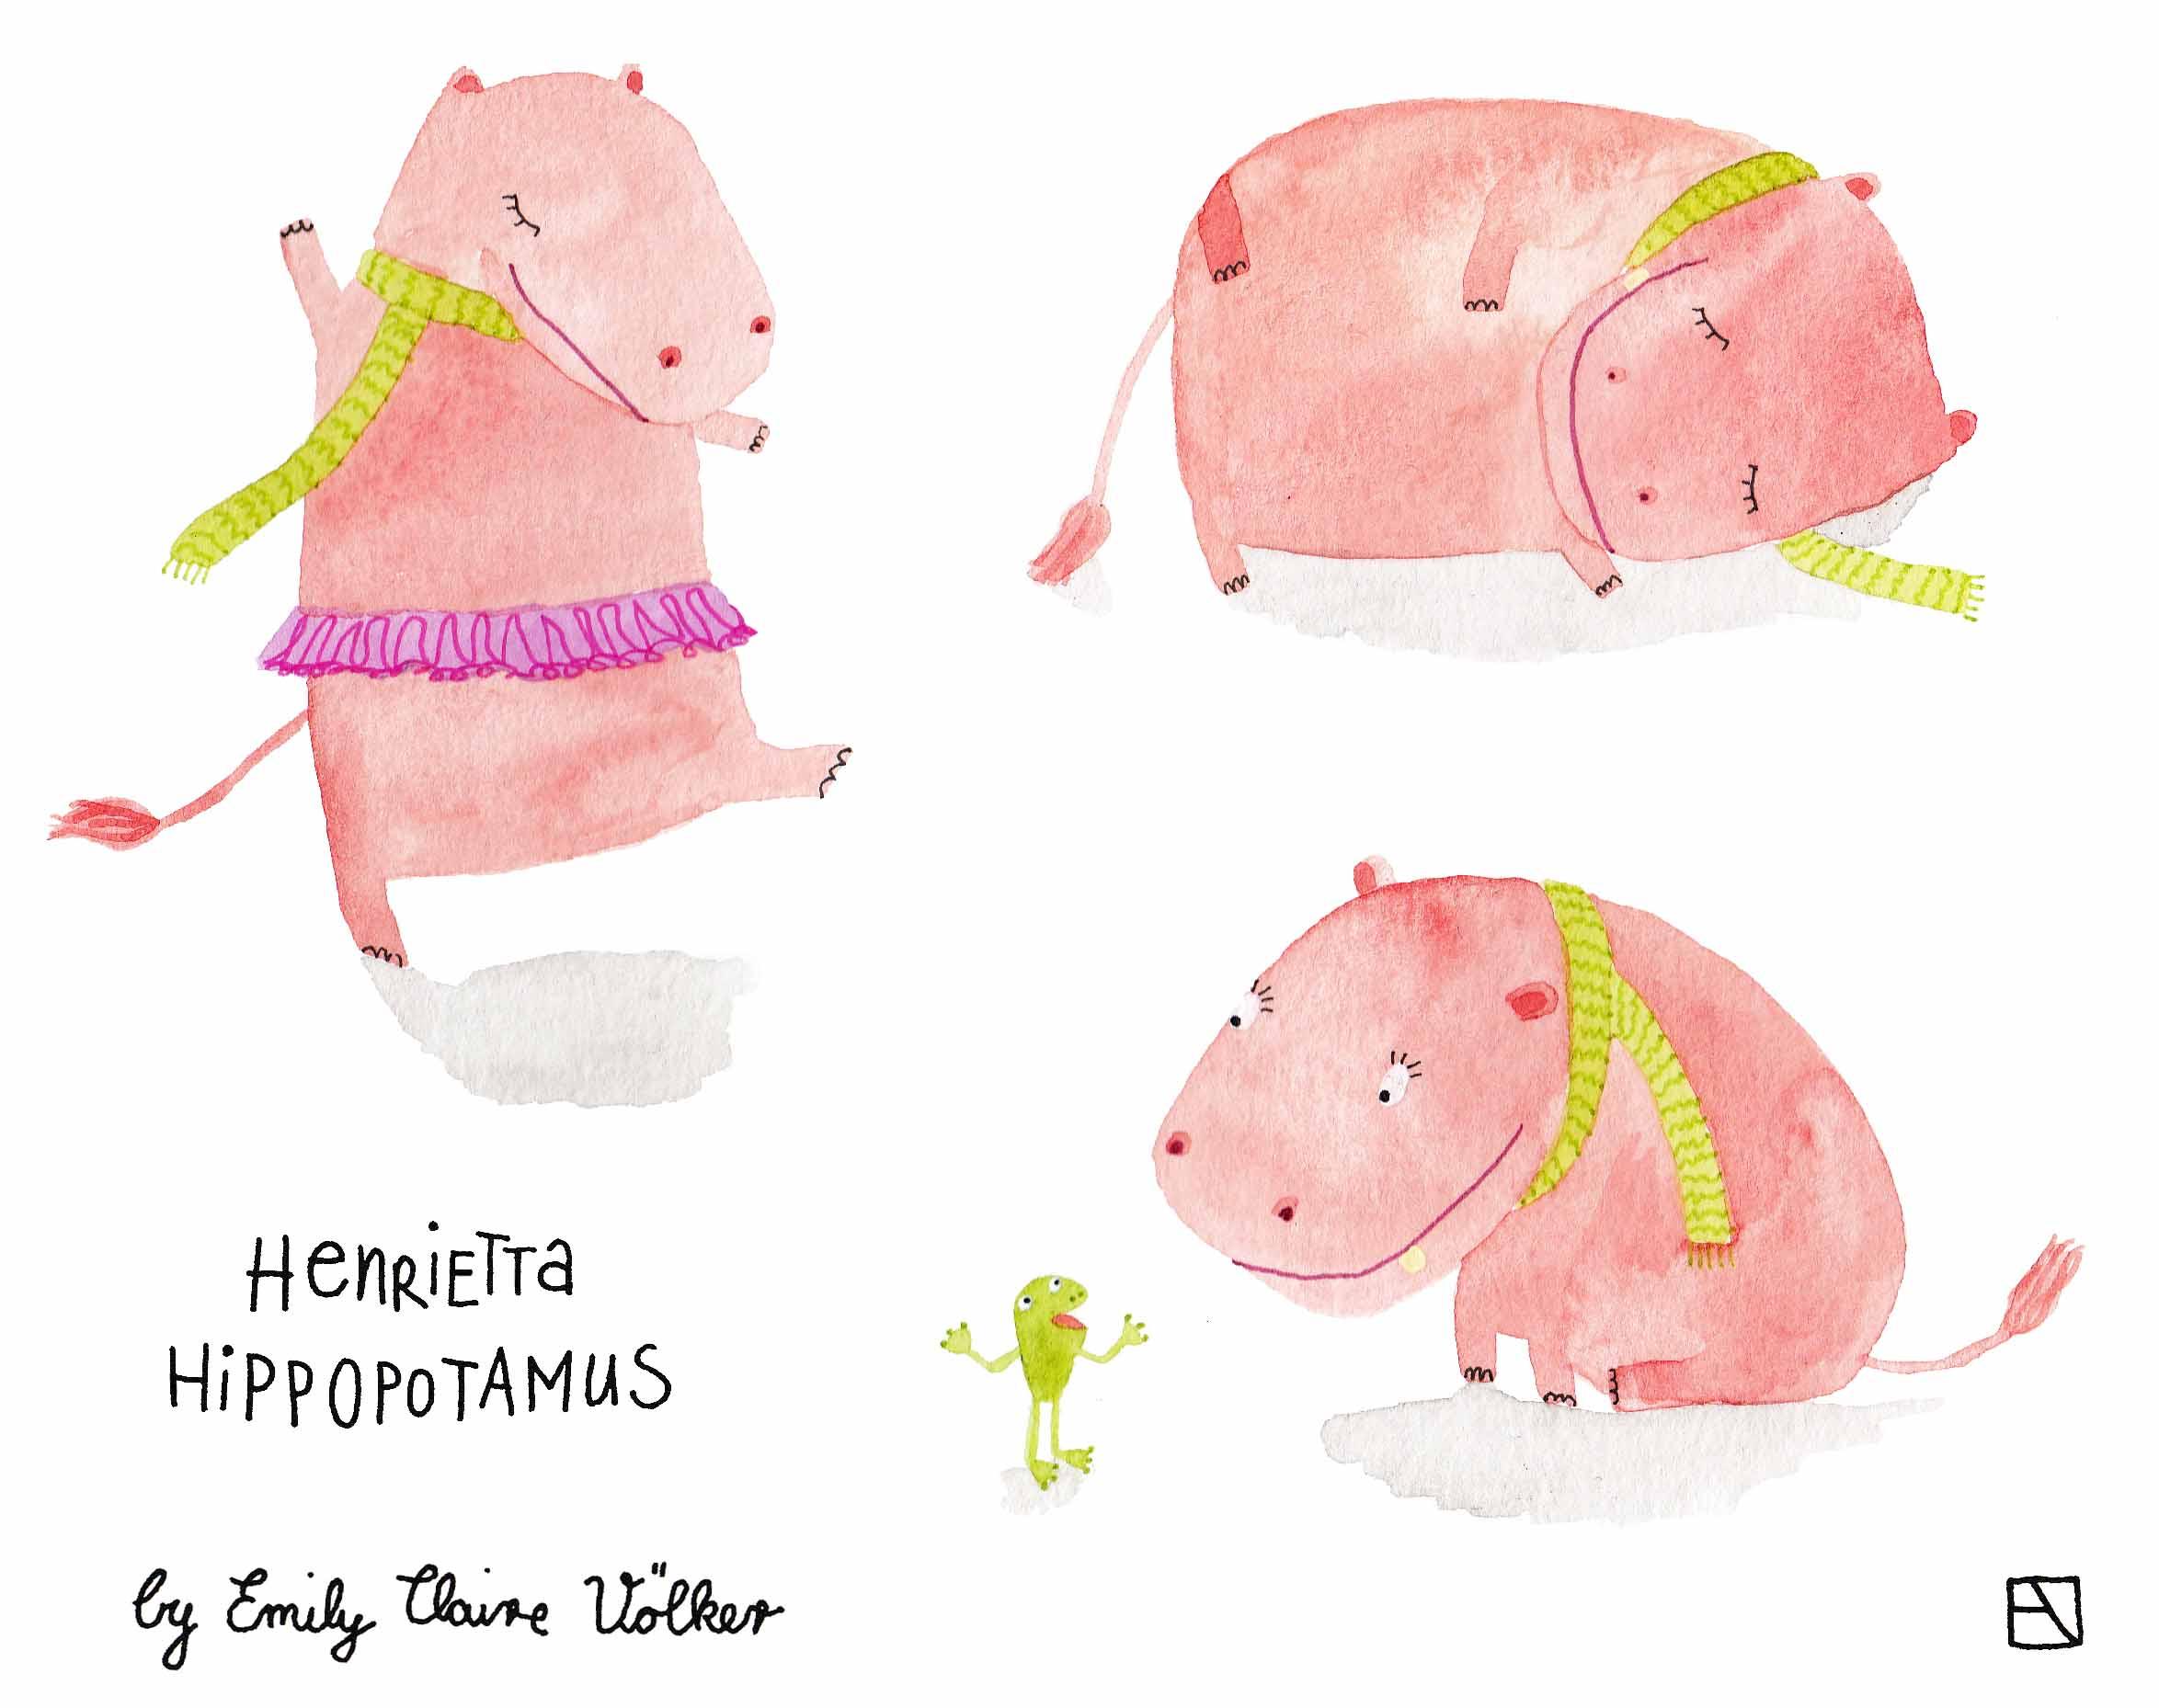 Henrietta Hippopotamus